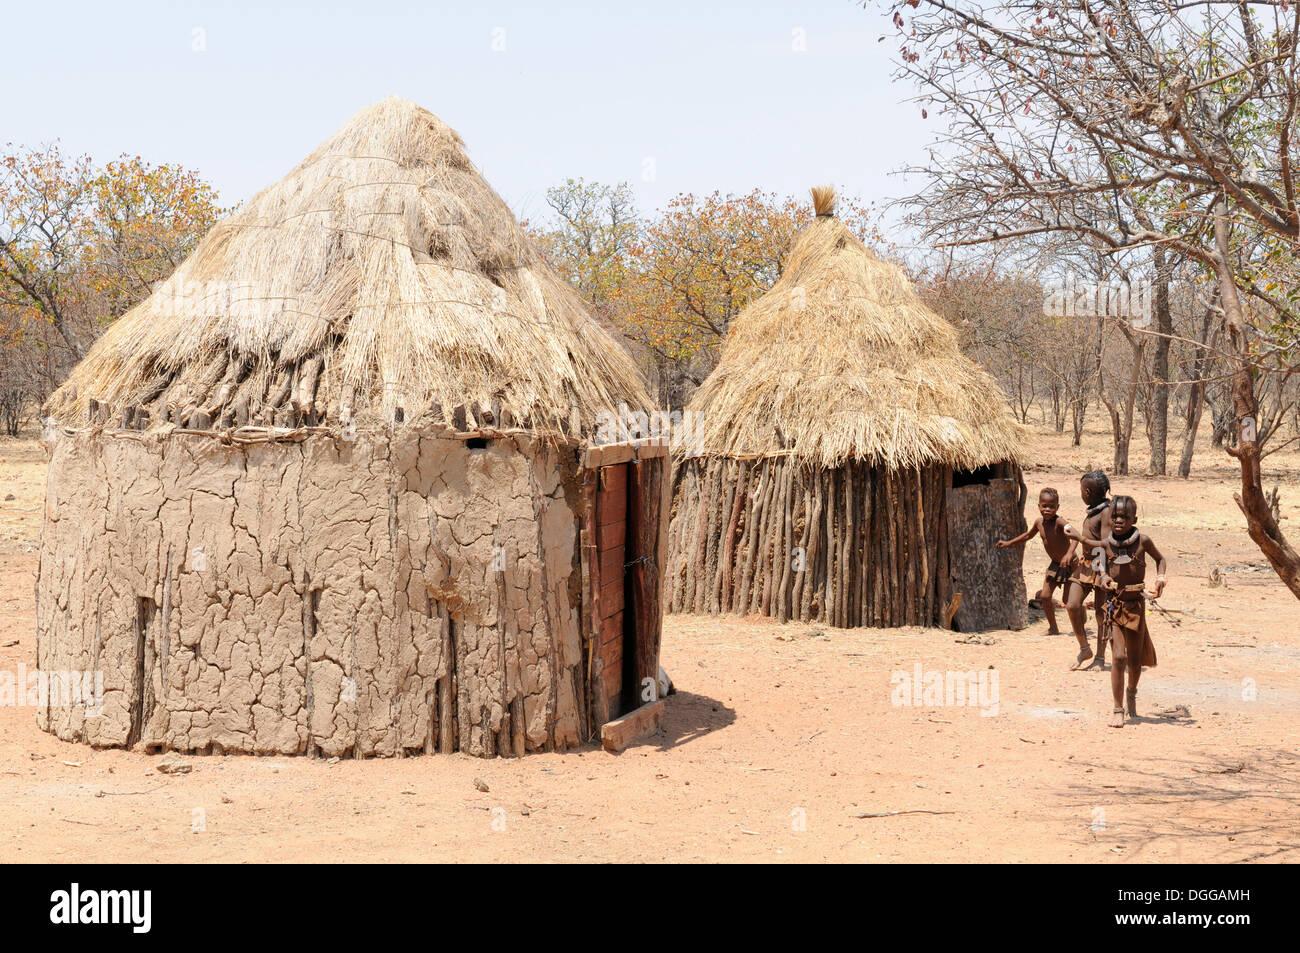 Himba children playing outside Himba huts in a Himba village, Kamanjab, Kunene Region, Namibia - Stock Image